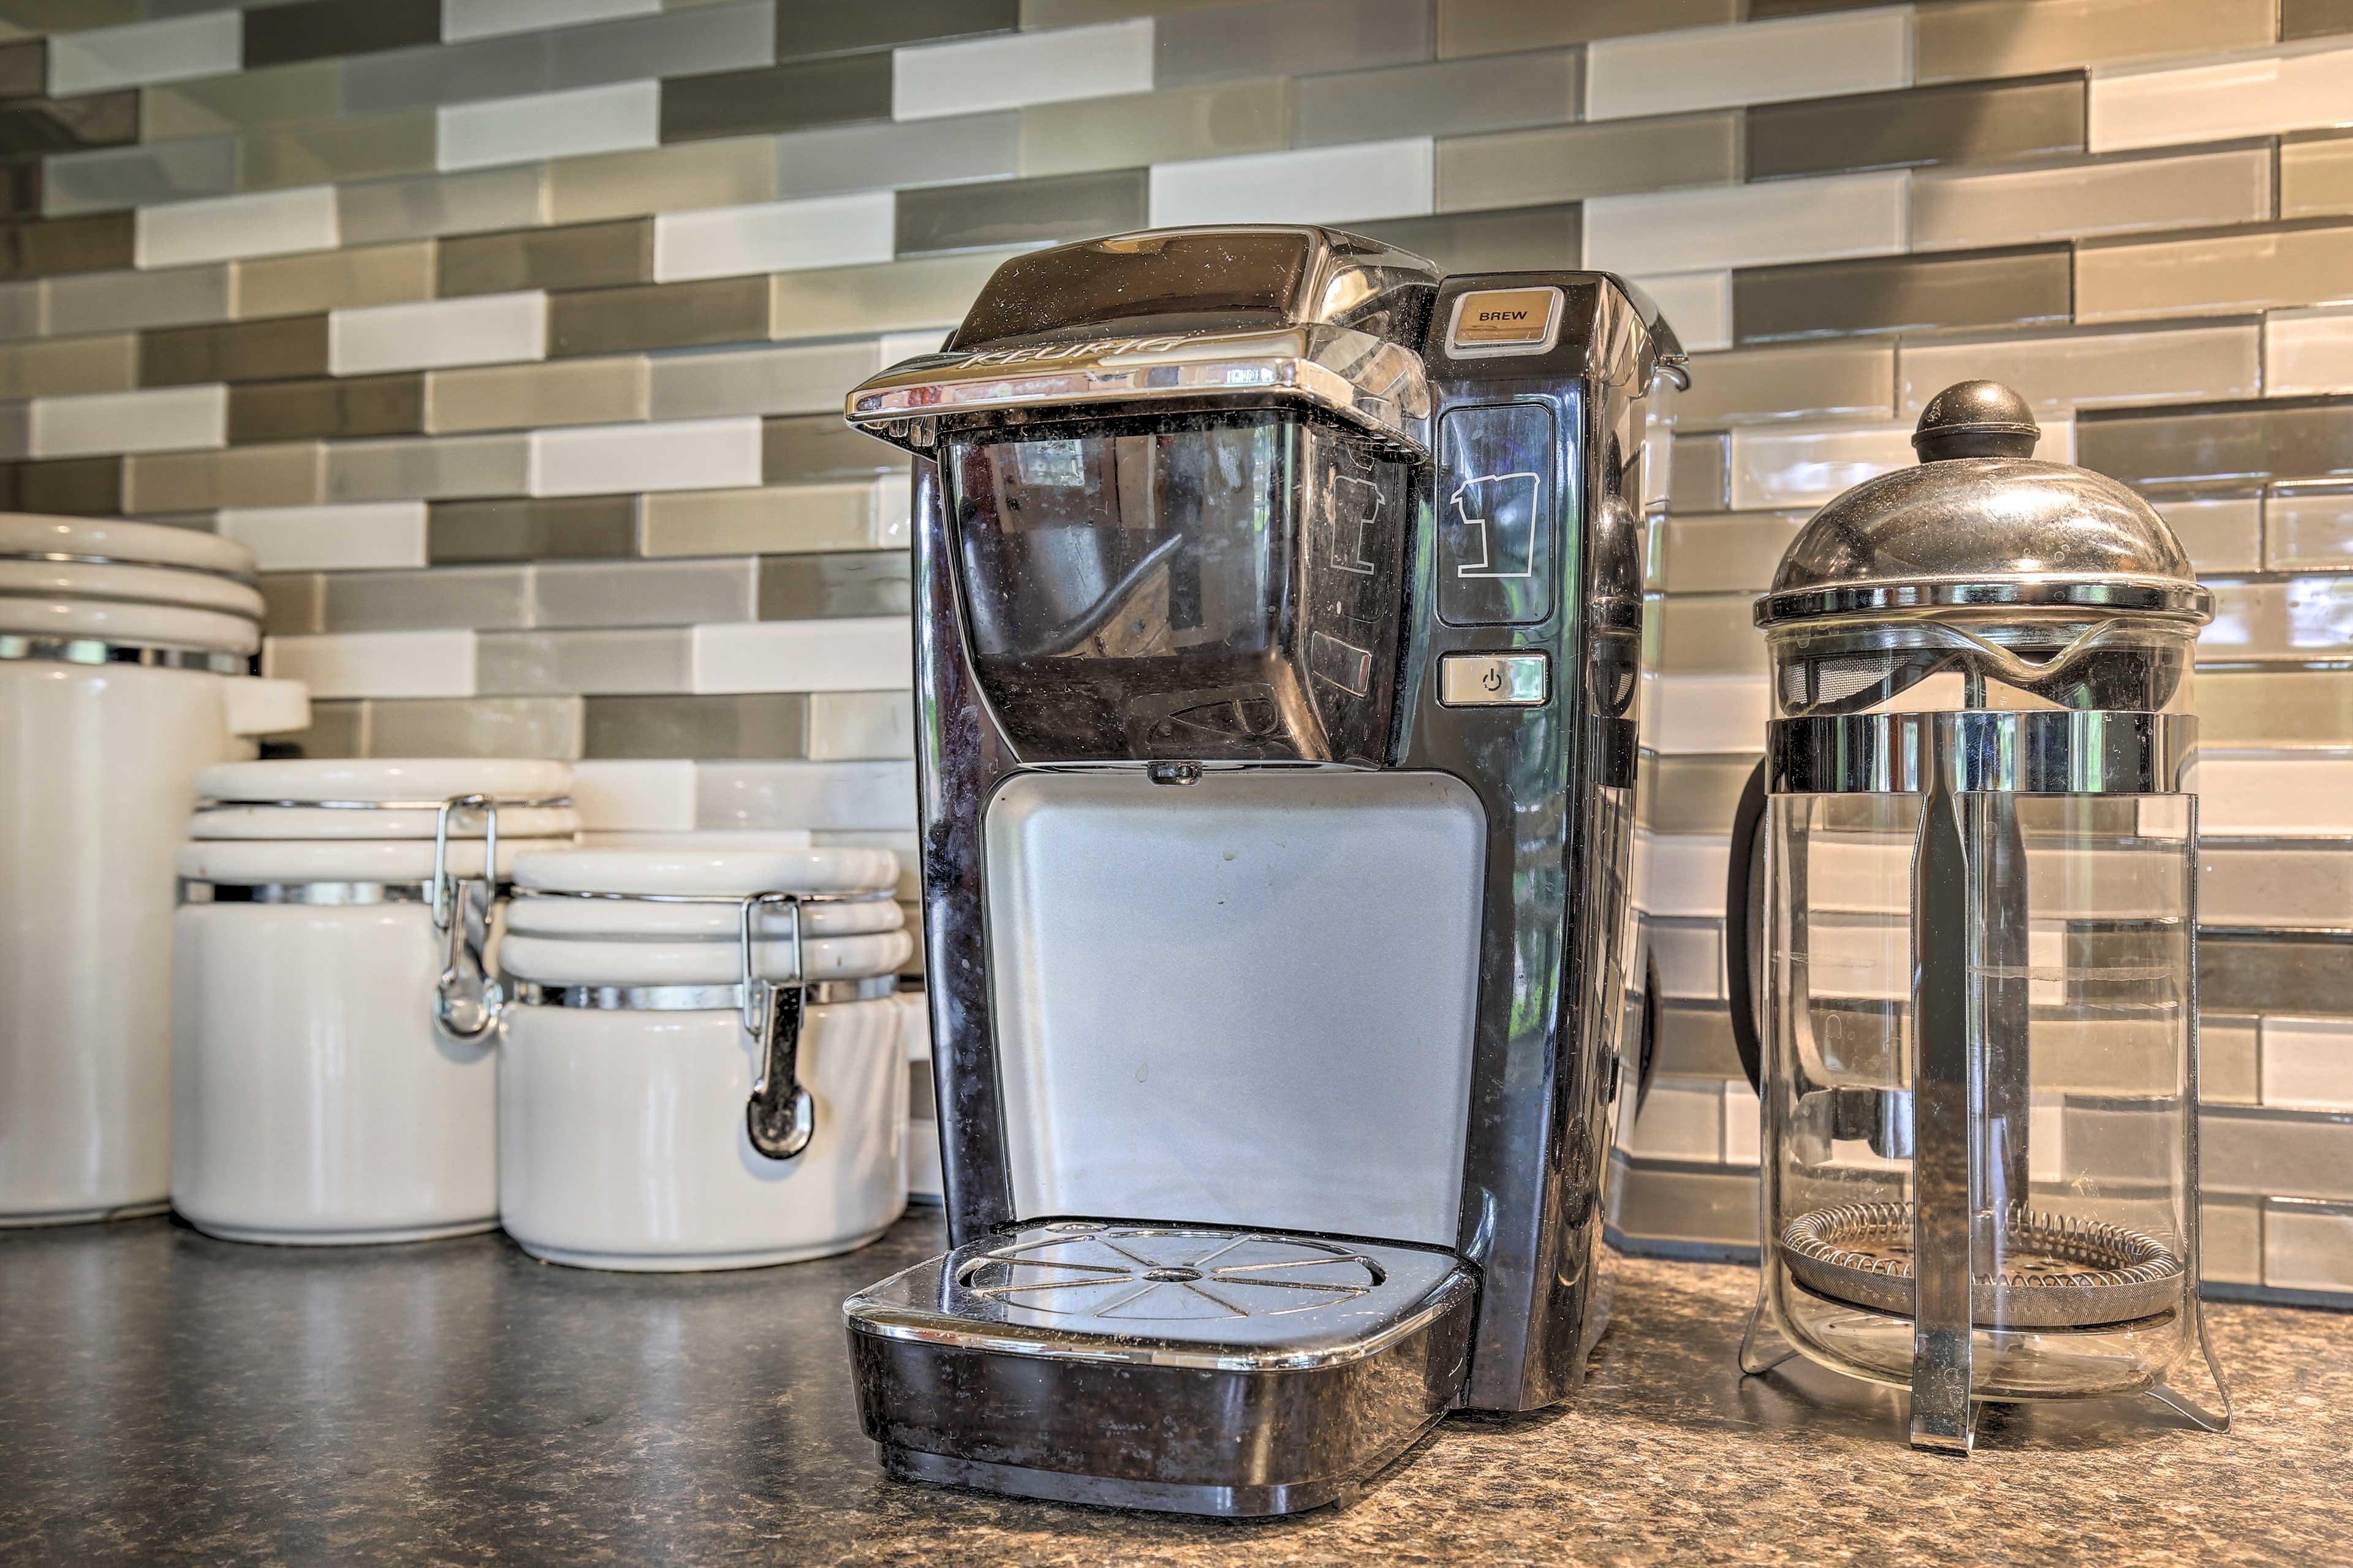 Kitchen | Keurig Coffee Maker | French Press